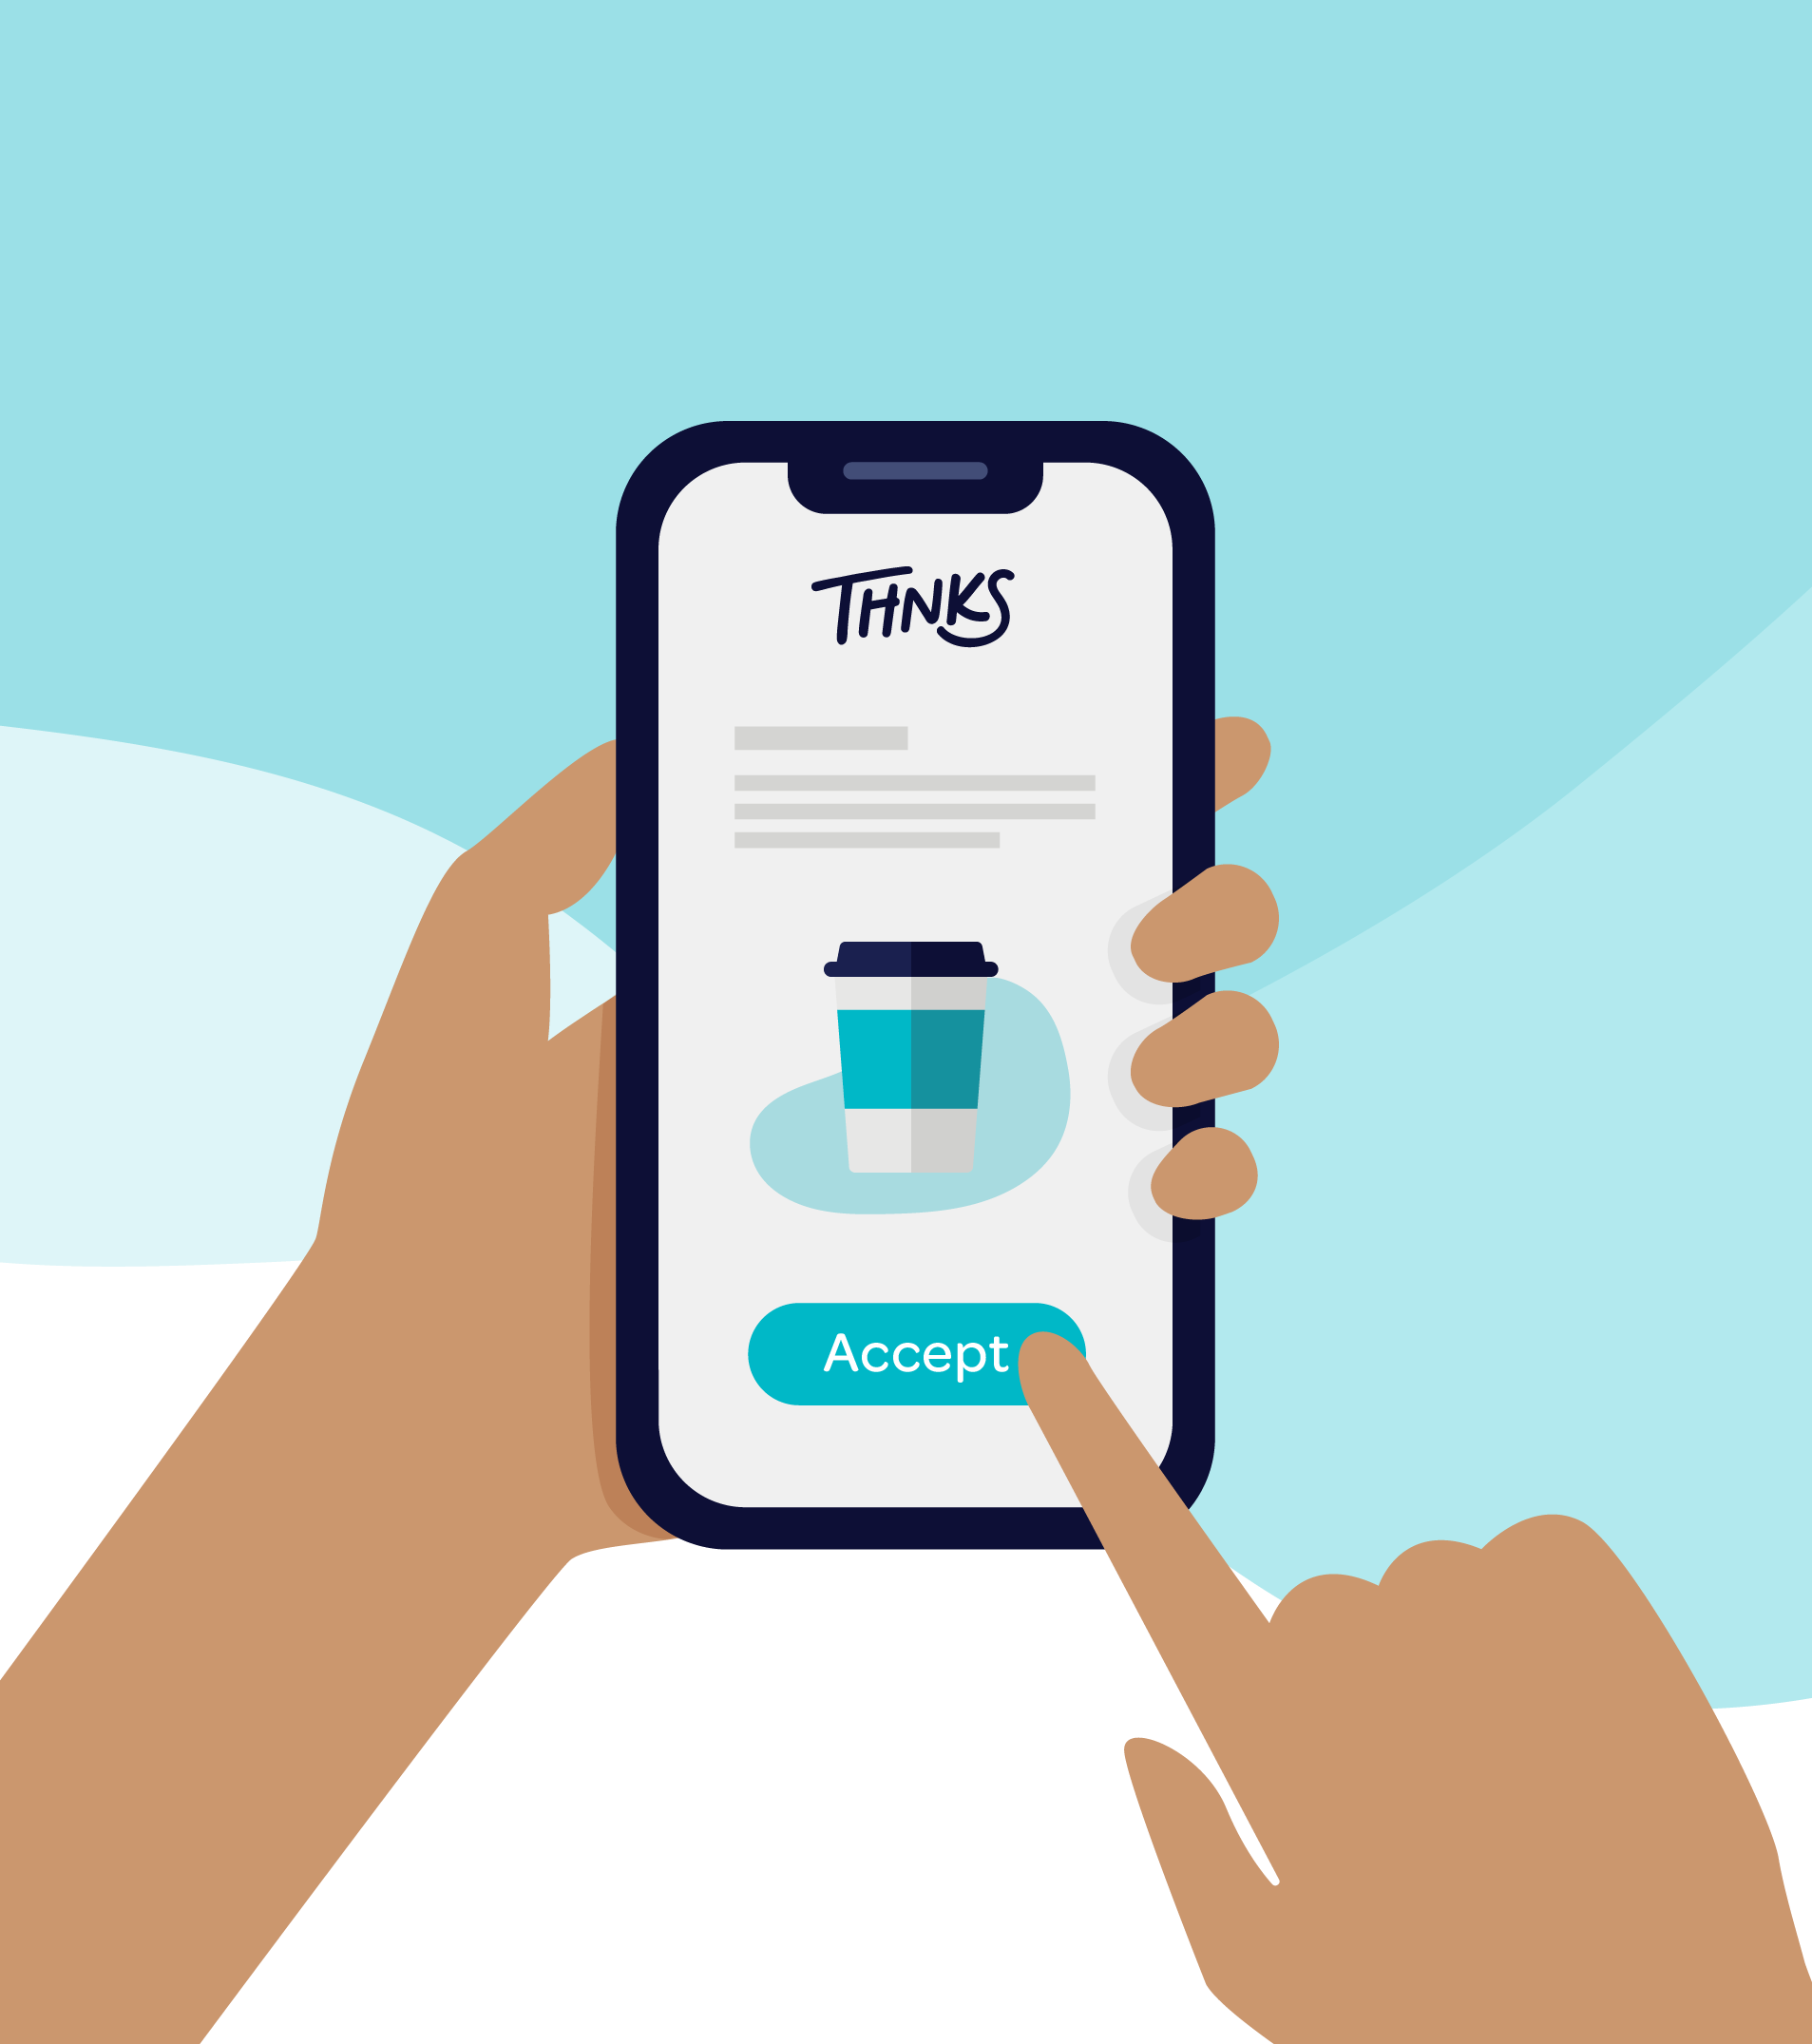 illustration of Thnks app